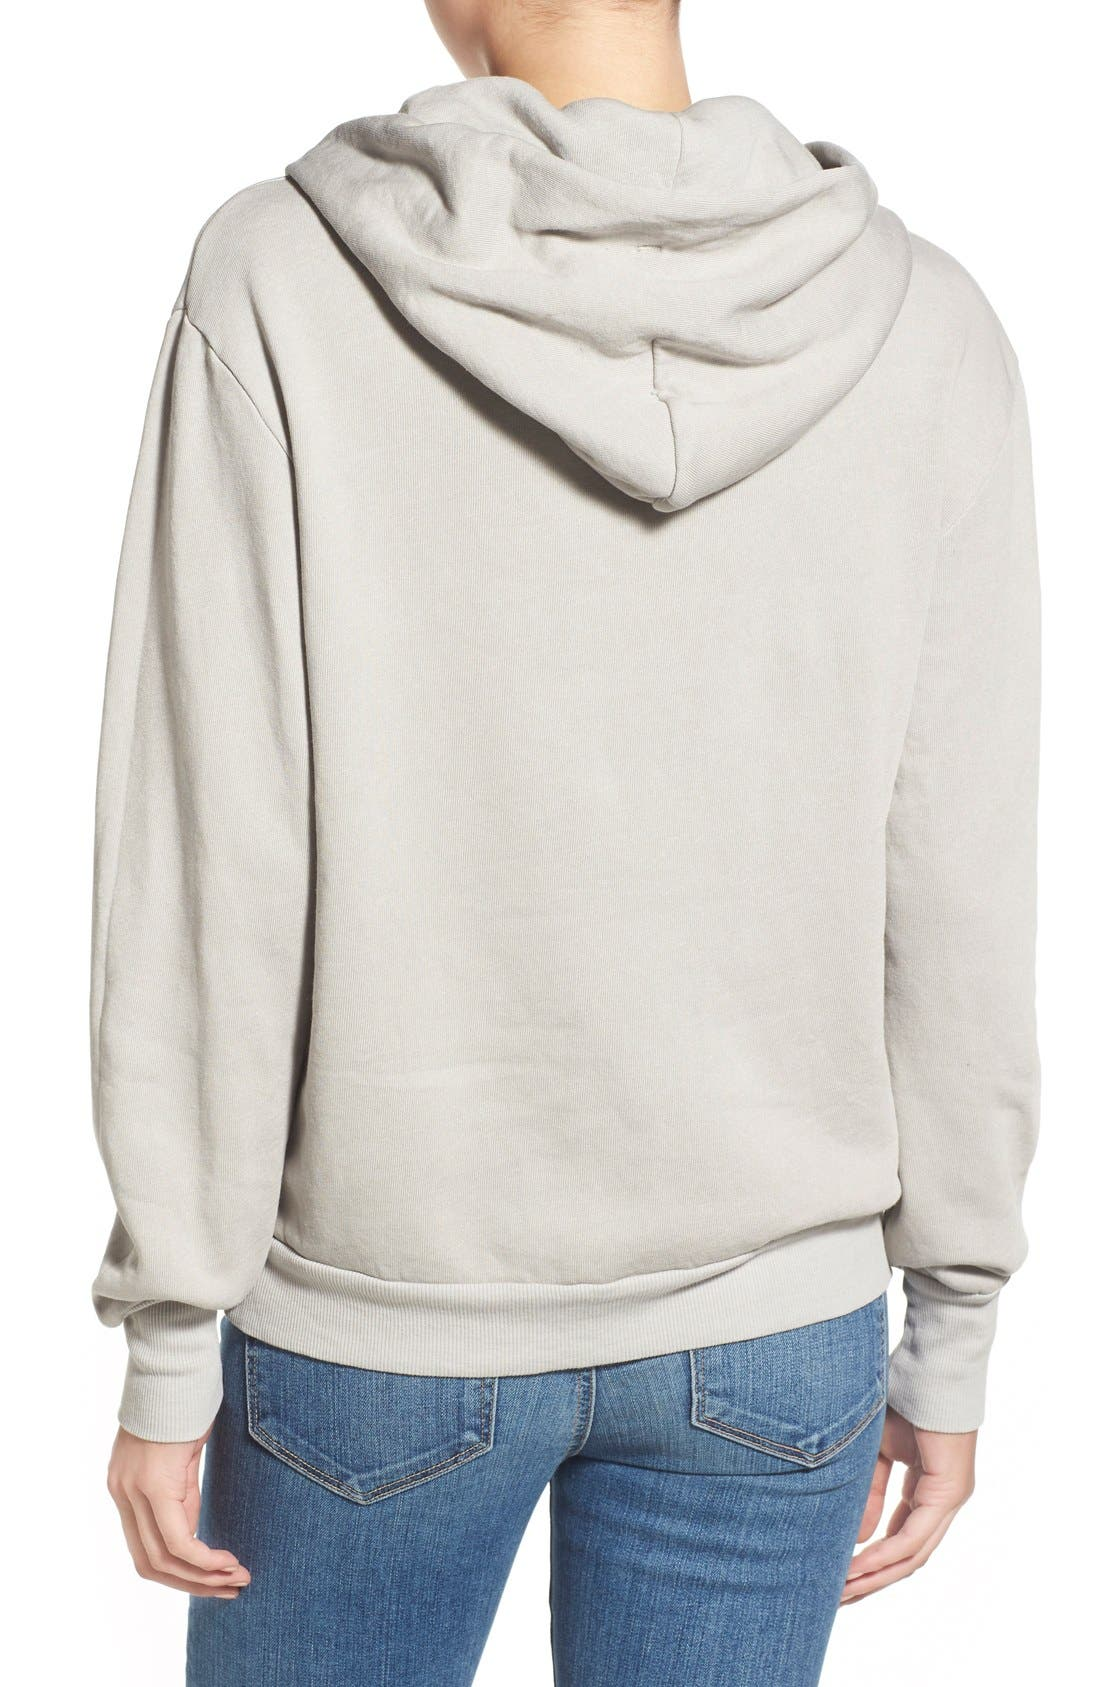 'Please Do Not Disturb' Hooded Sweatshirt,                             Alternate thumbnail 5, color,                             060